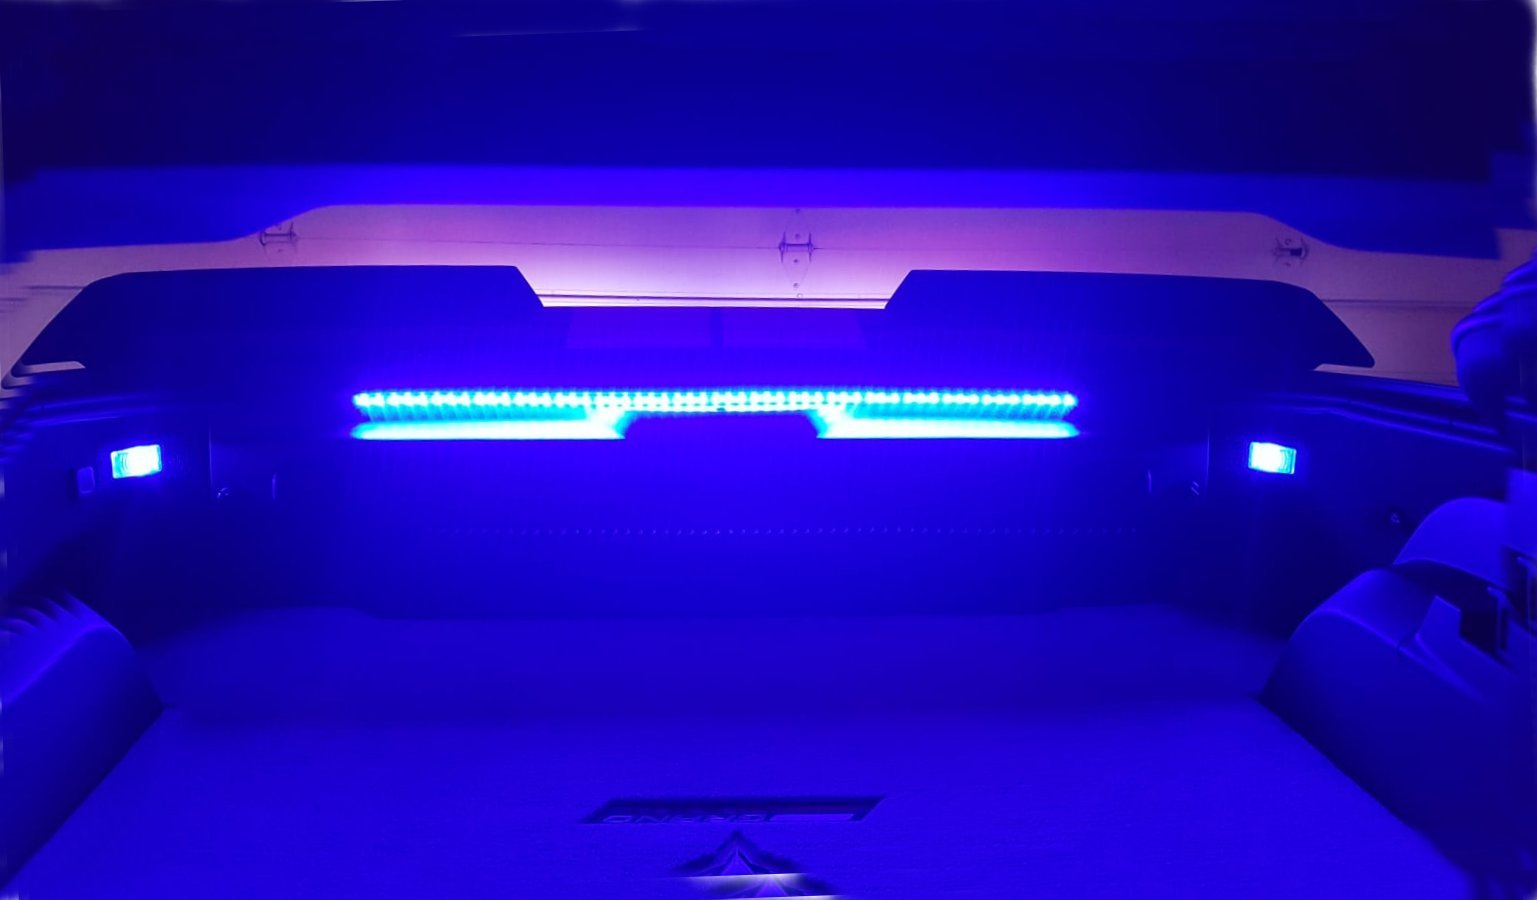 C7 Corvette Led Trunk Compartment Hatch Strips Lighting